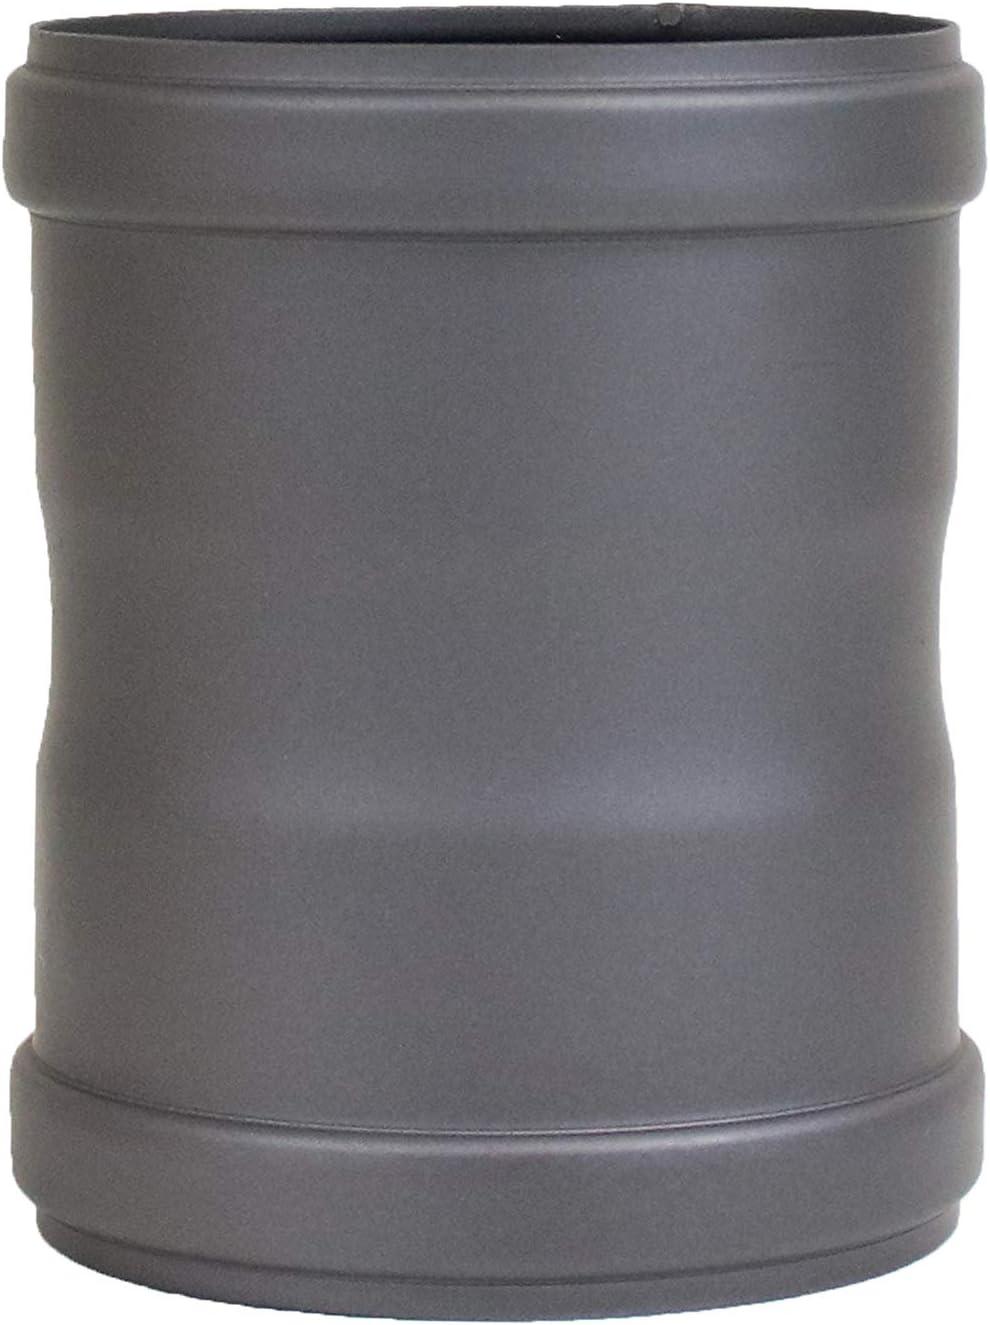 130/mm color negro 80/mm de di/ámetro lanzzas Pellet Pell etrauch Tubo Pellet estufa de pellets Chimenea Tubo verbi ndun t/ück Tubo manguitos dobles longitud aprox